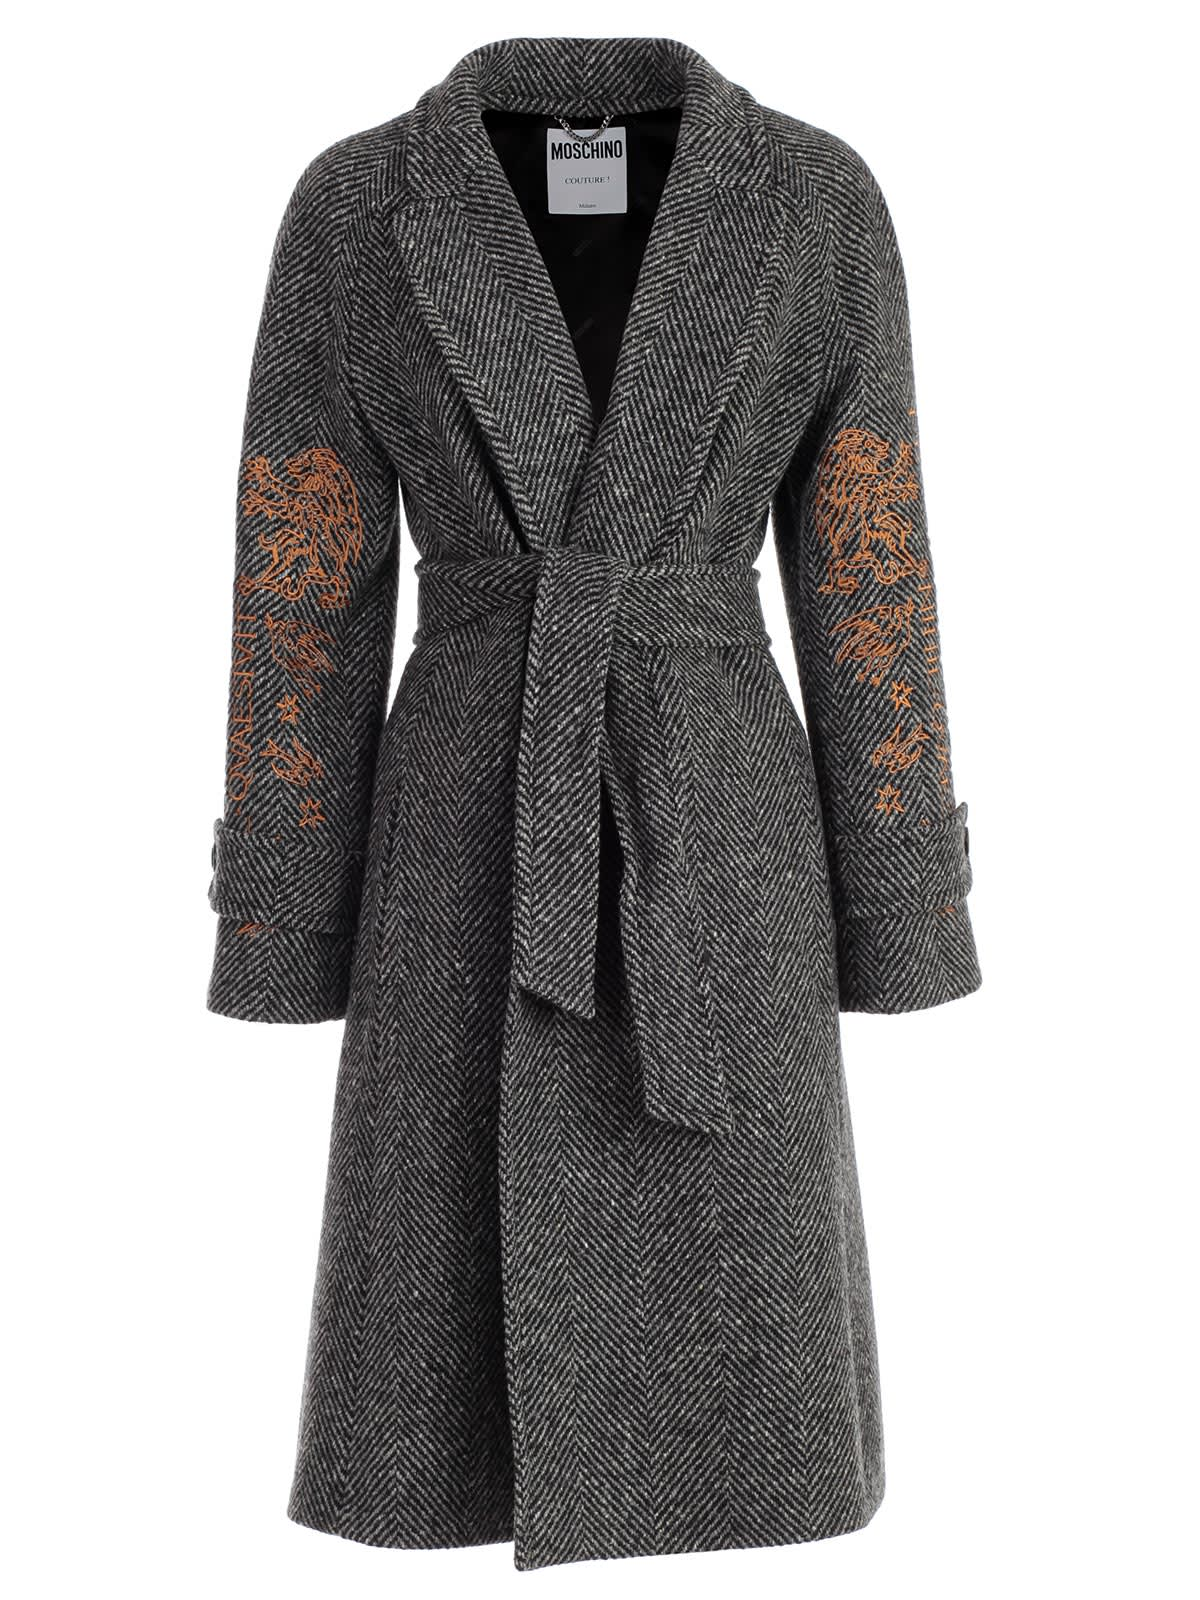 Moschino Dress L & s V Neck